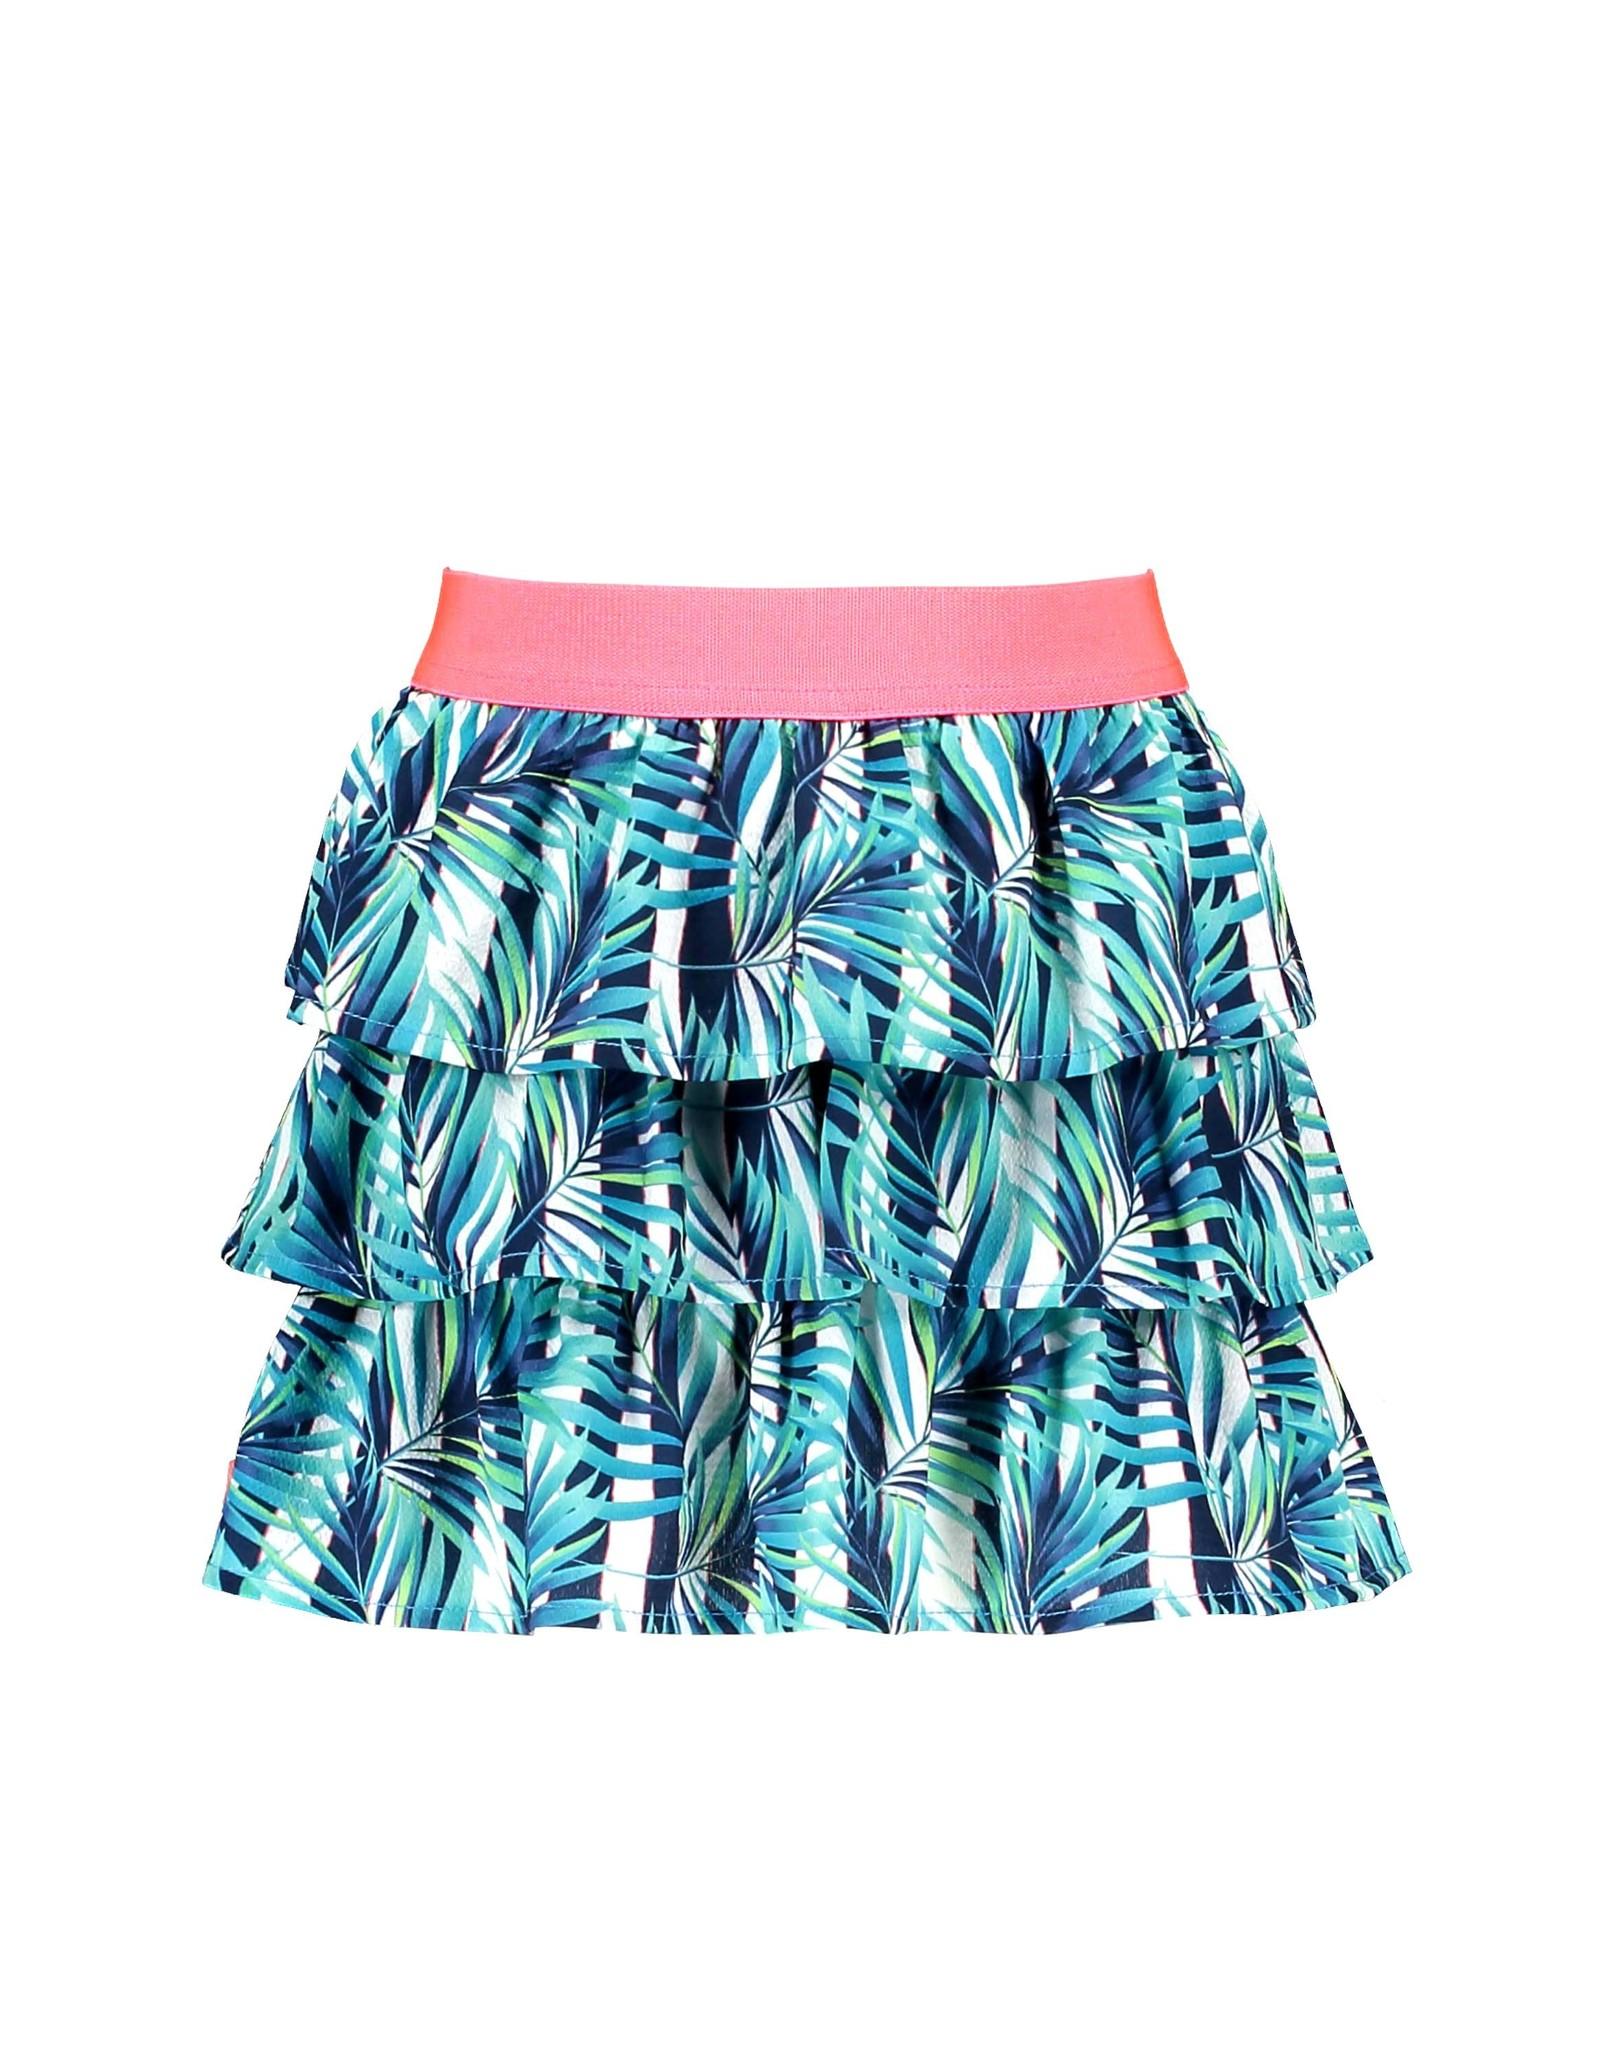 B-Nosy Girls tropical palm ao skirt